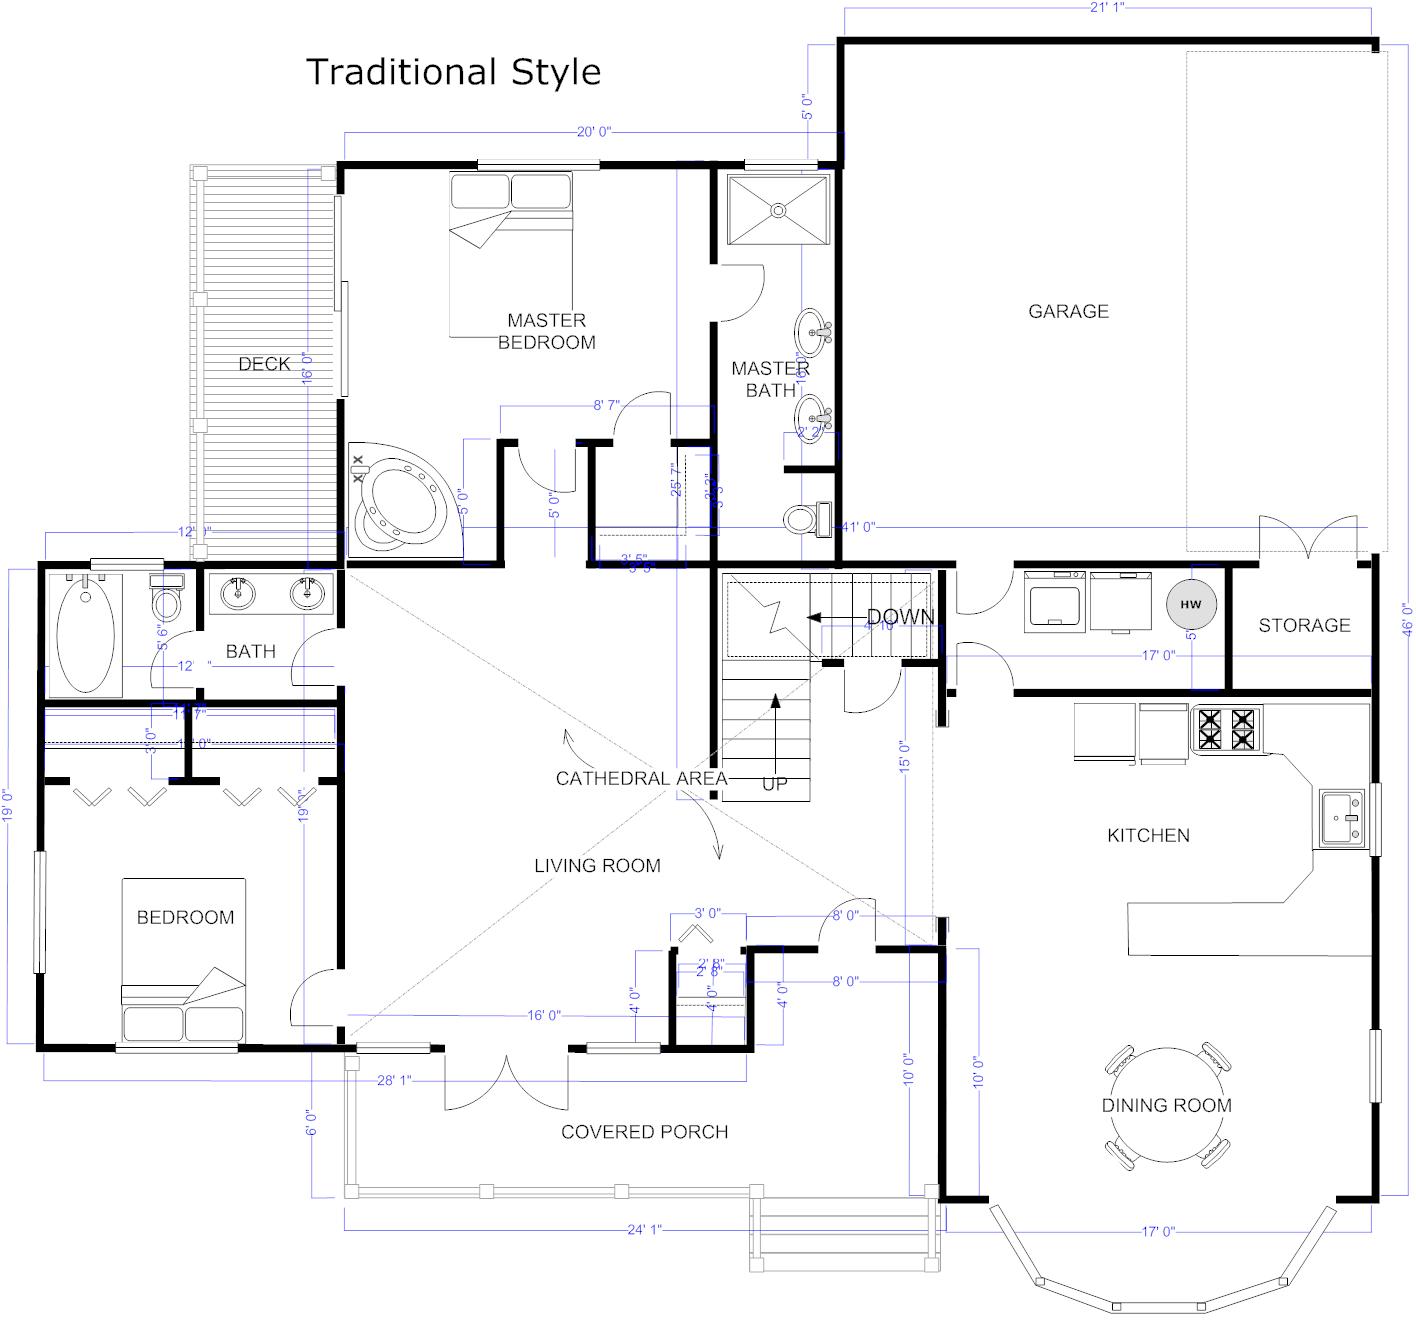 Smartdraw House Design Software